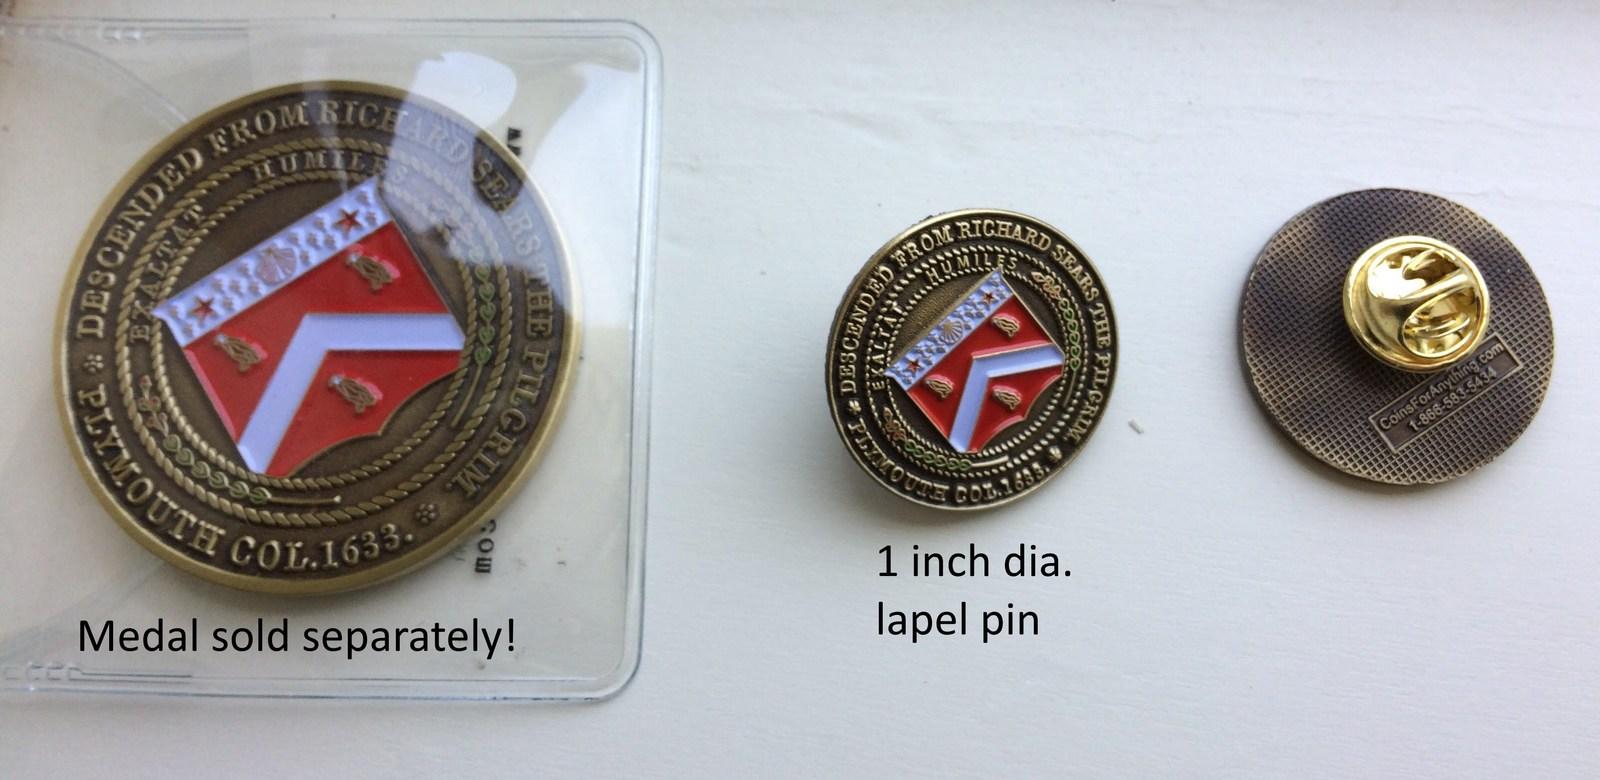 Sears Coat of Arms lapel pin